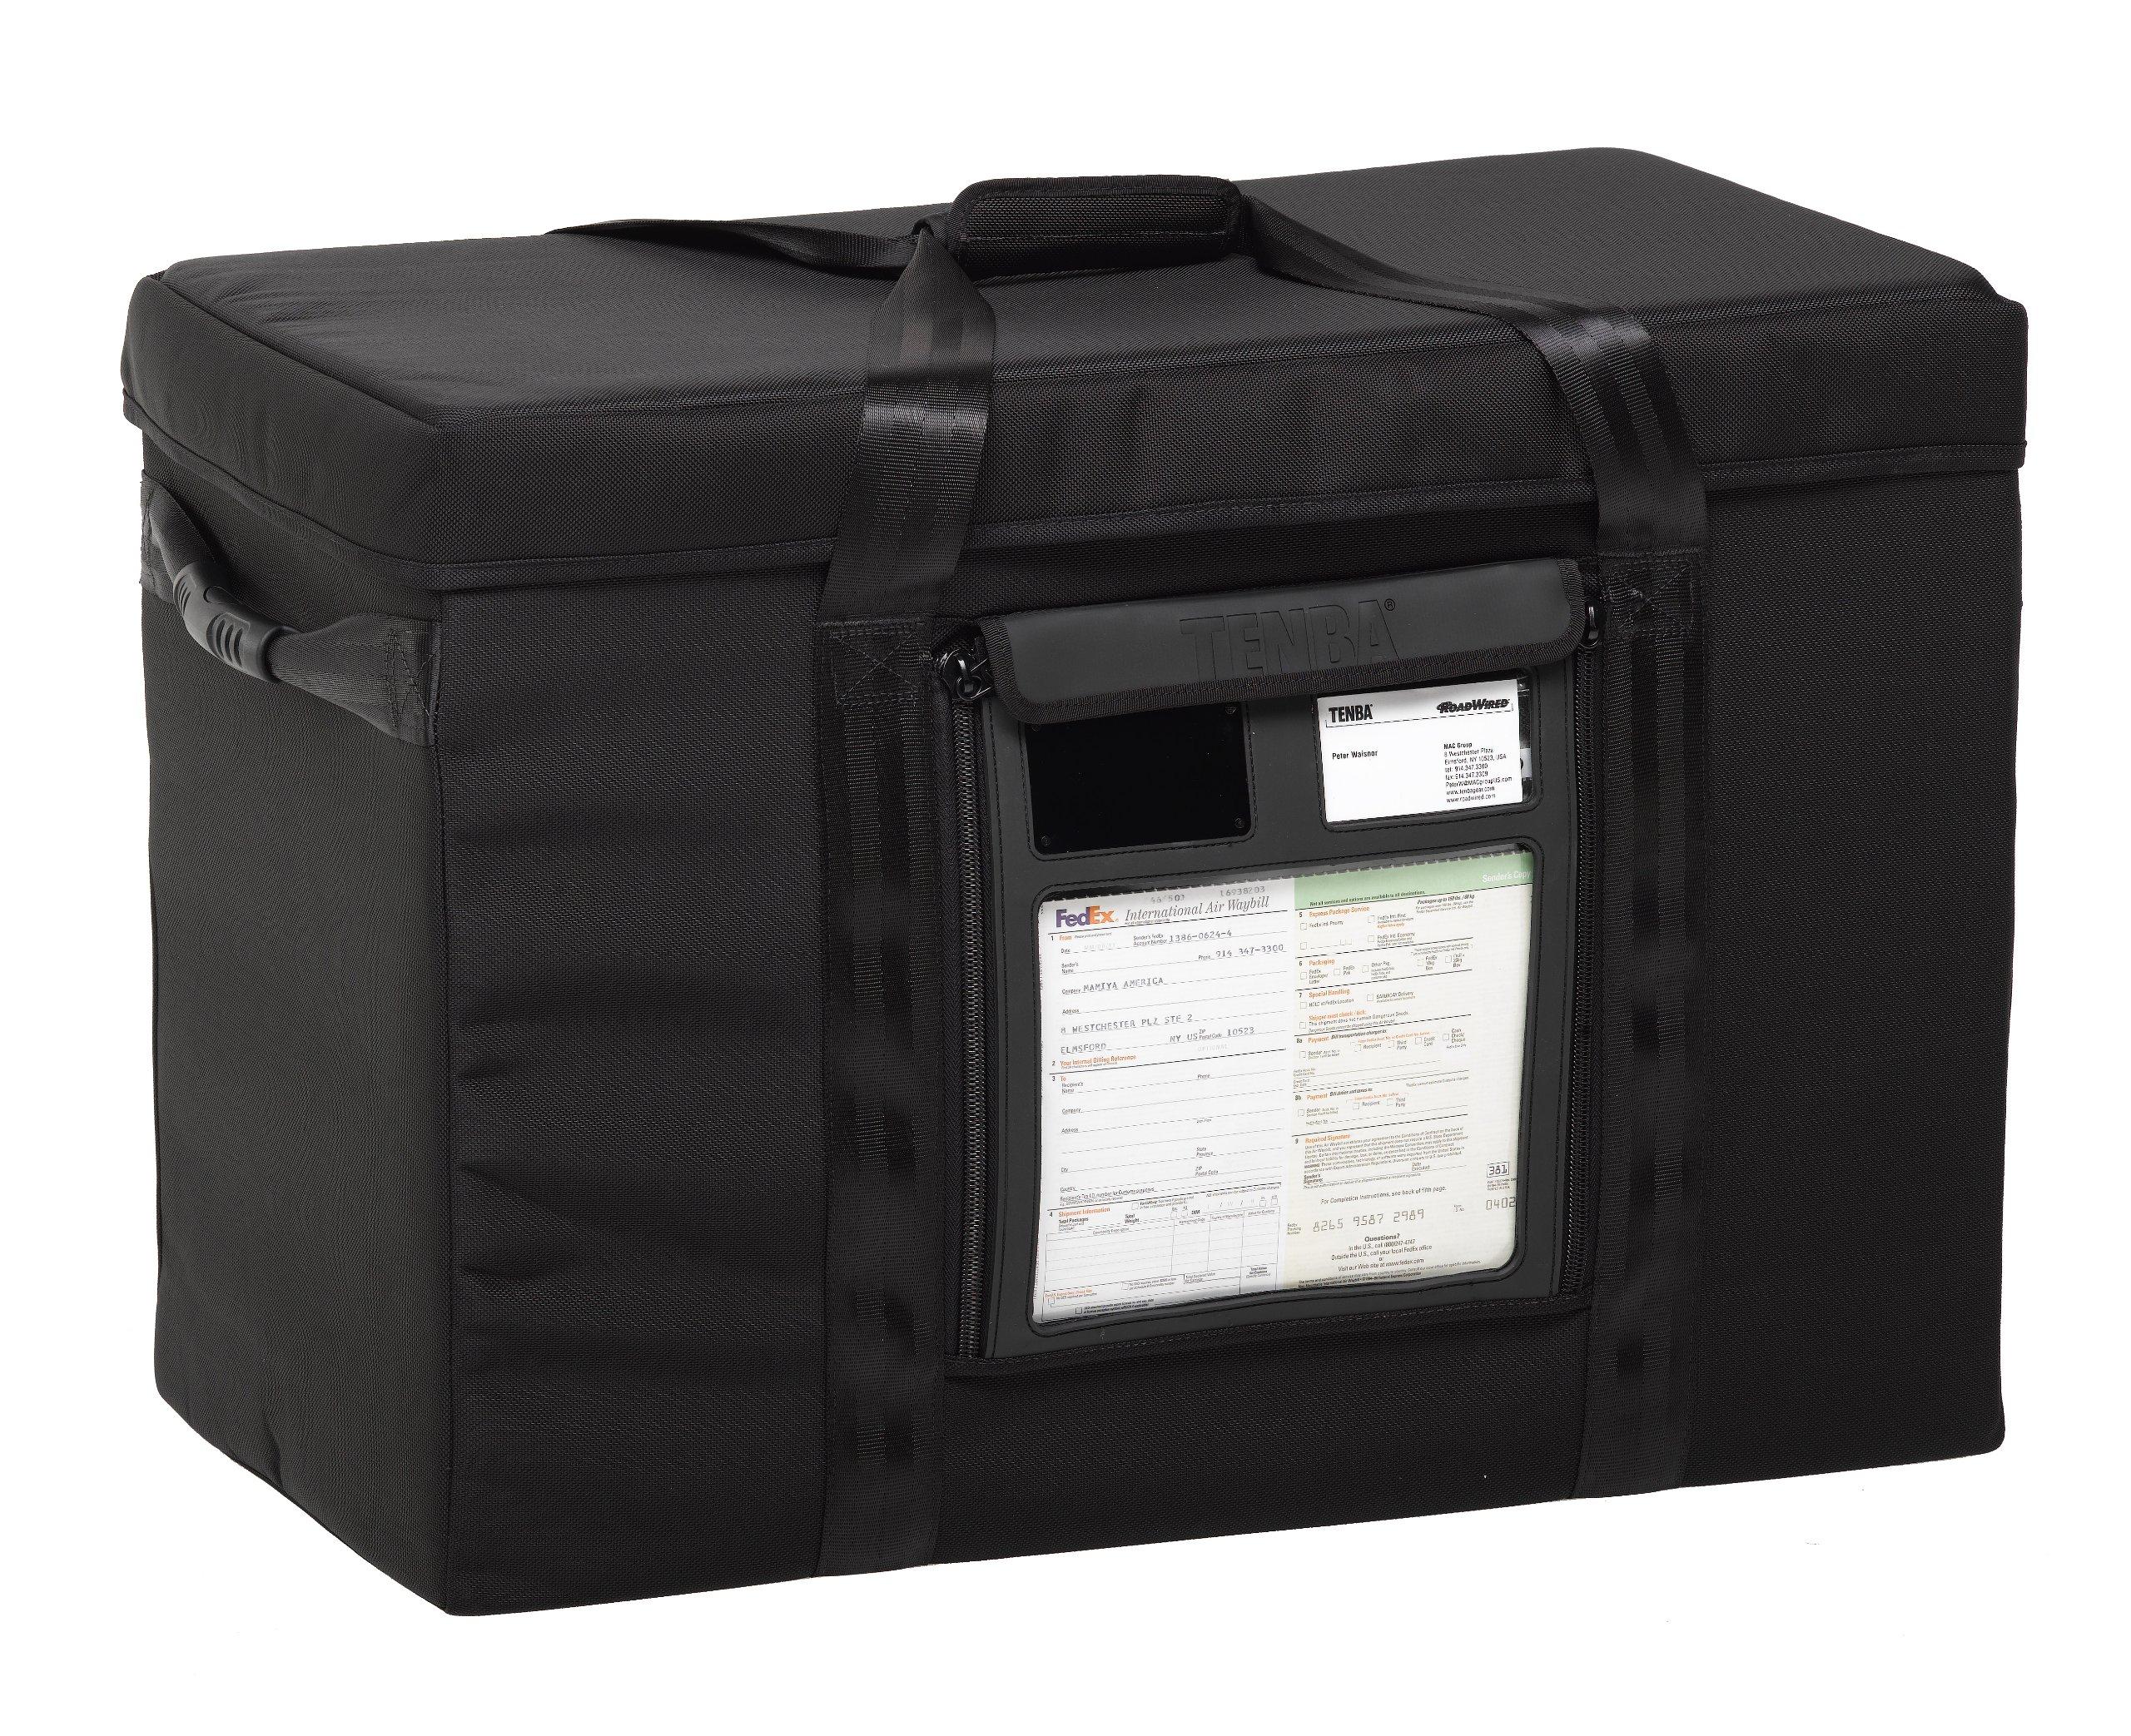 Tenba 4 Light Head Extra Deep Air Case Topload (634-137)